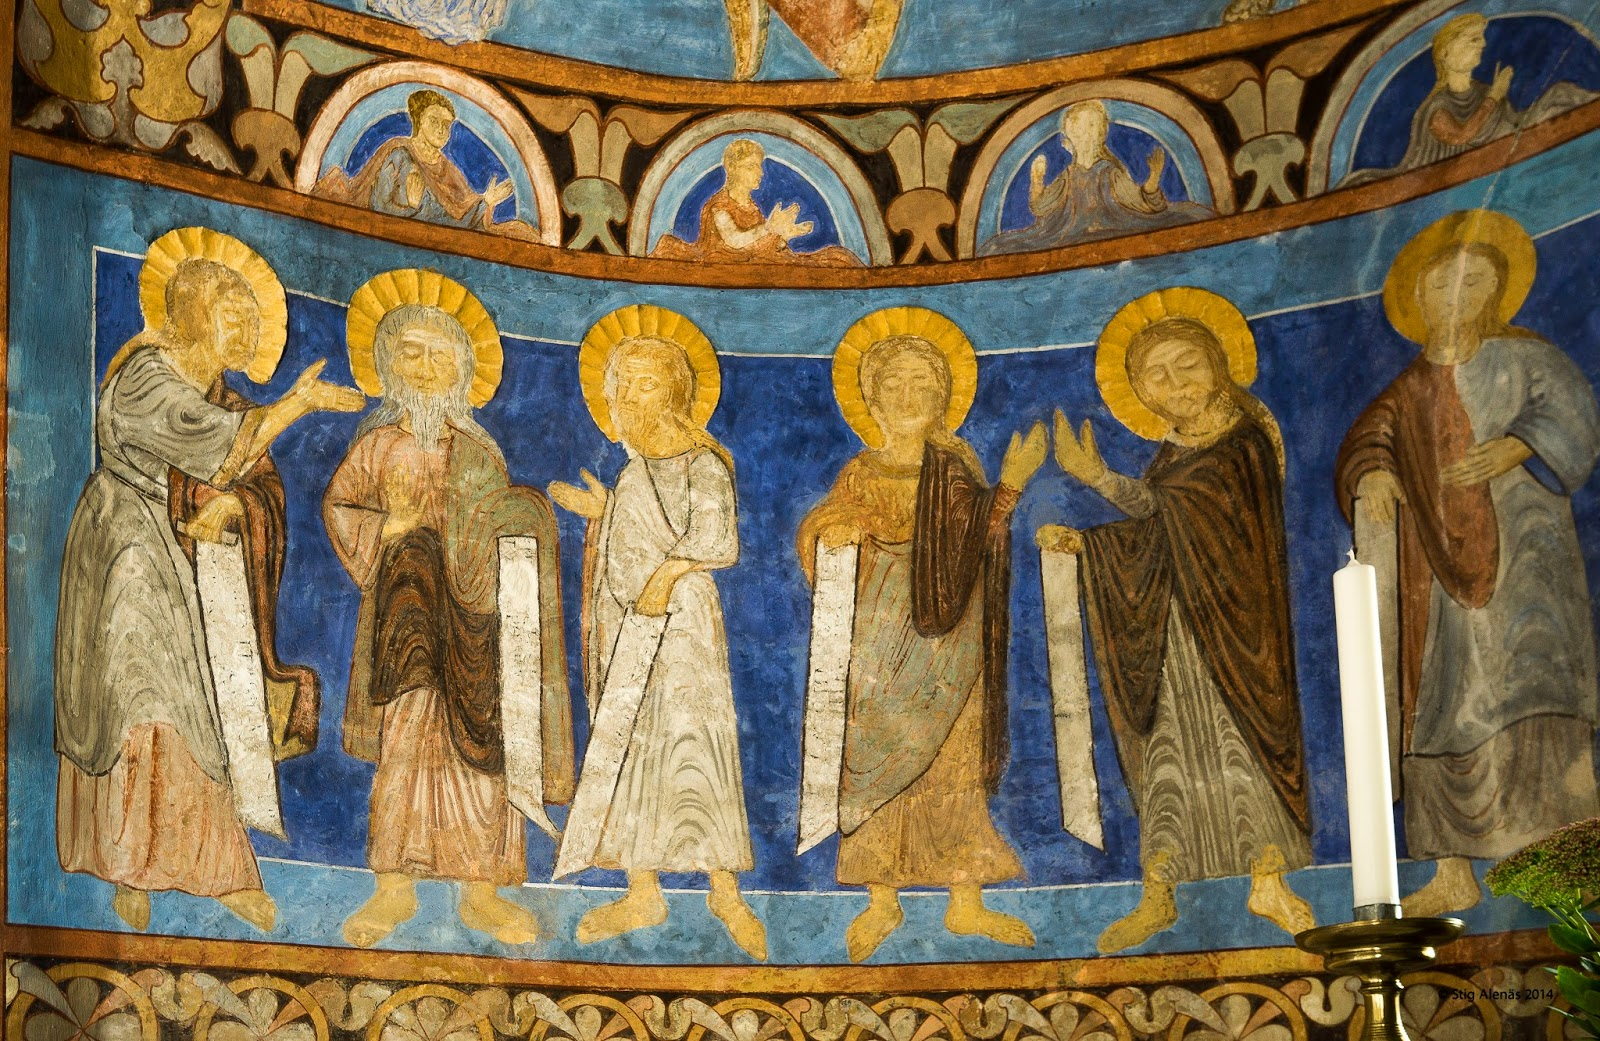 church, barefoot, byzantine, halo, stucco, apse, ultramarine, disciples, fresco, illustrative